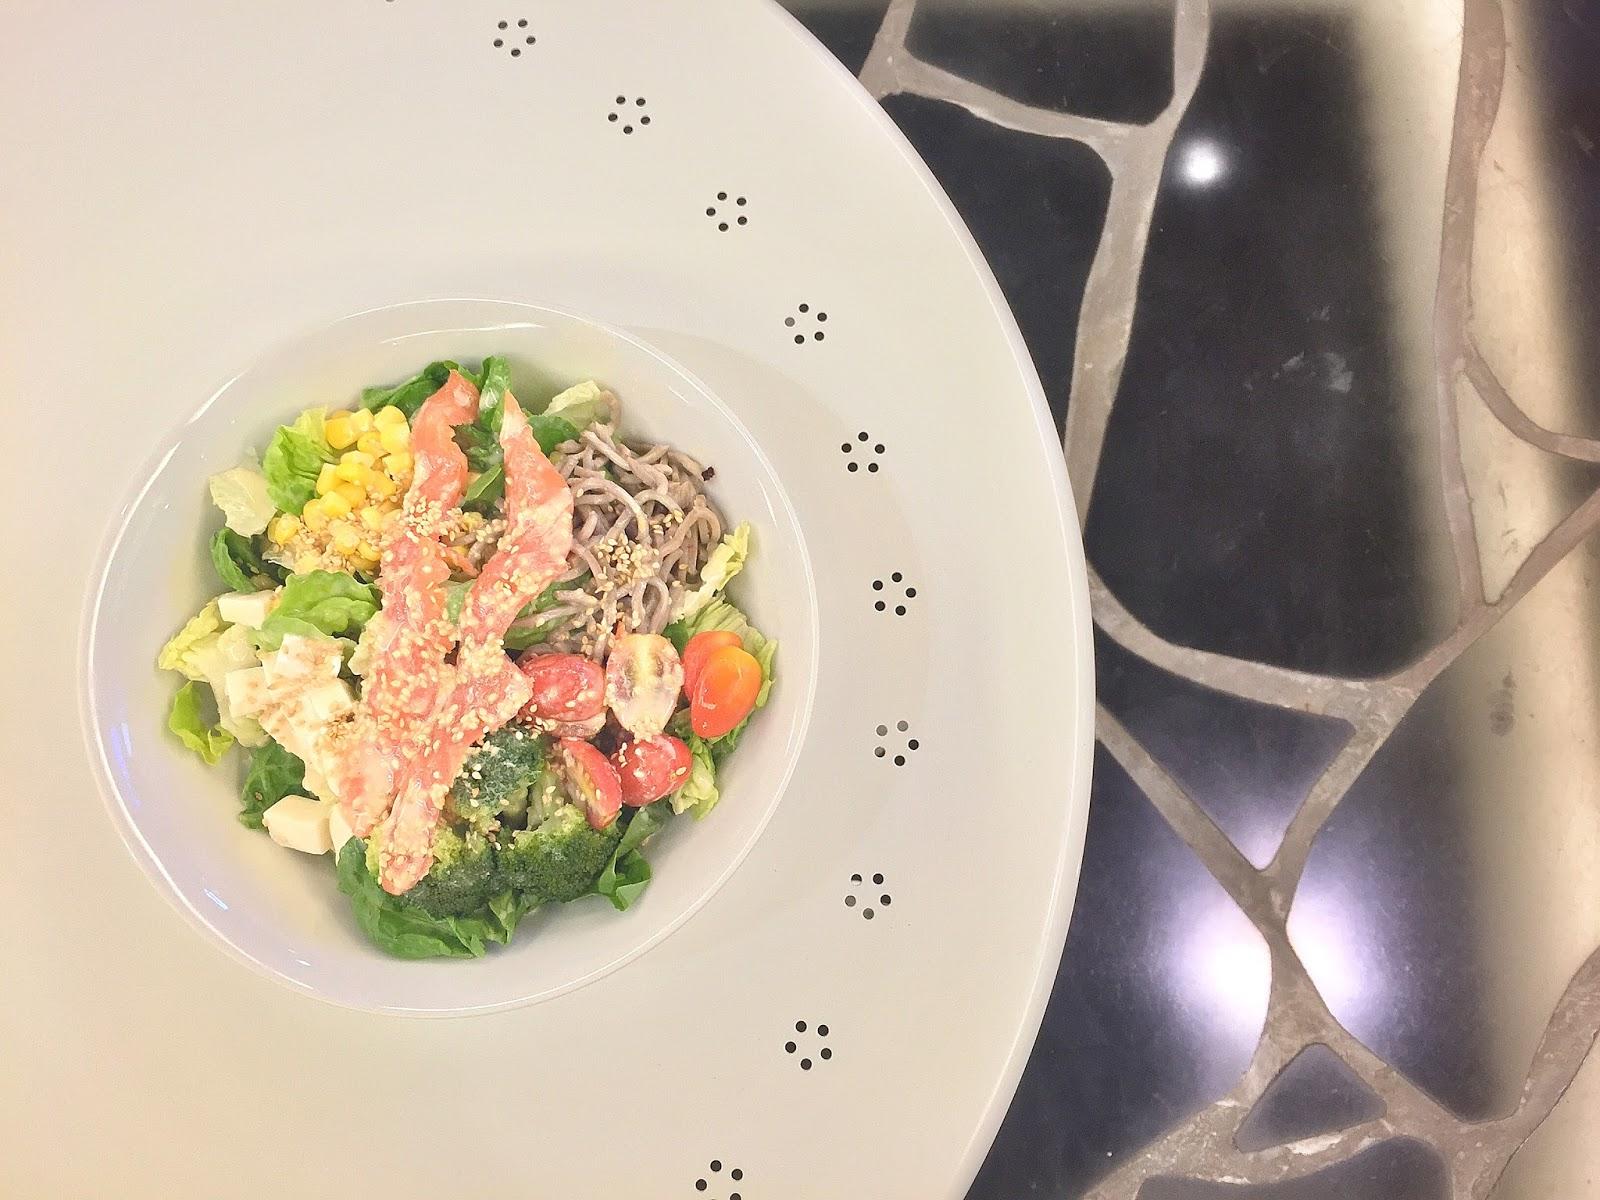 Green Rabbit Crepe & Salad Gastrobar - Koi Nippon